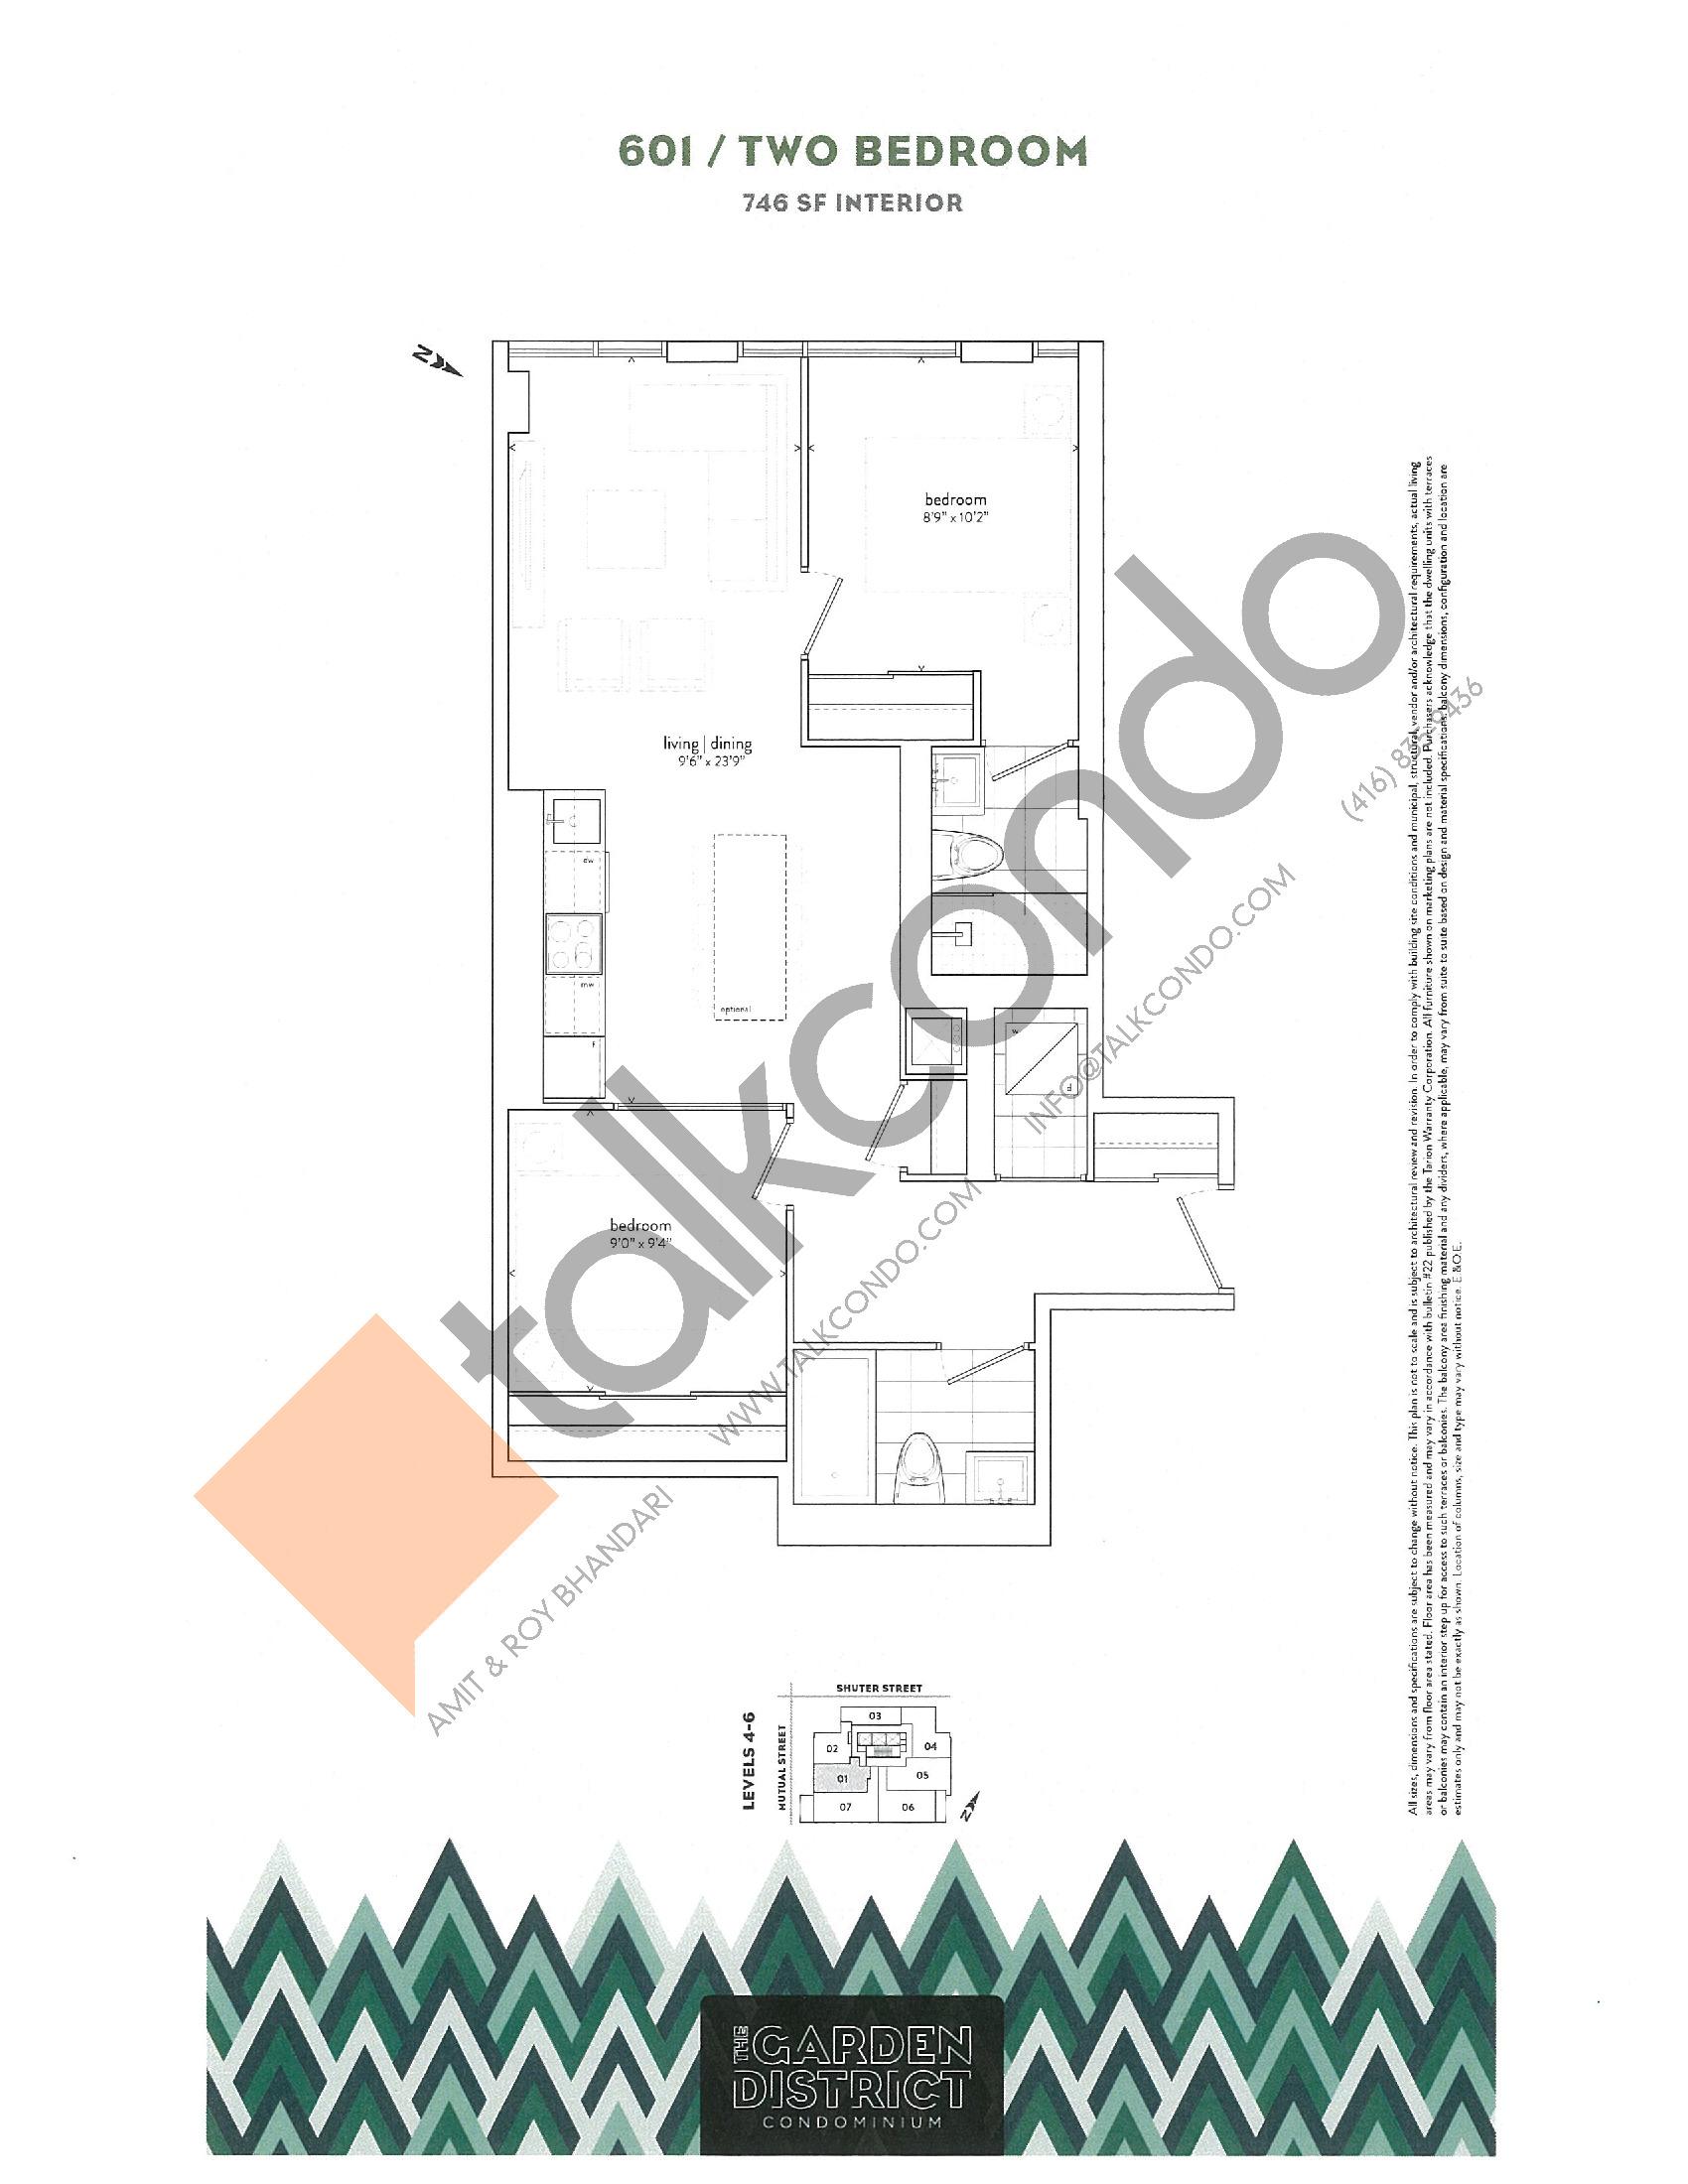 601 Floor Plan at Garden District Condos - 746 sq.ft